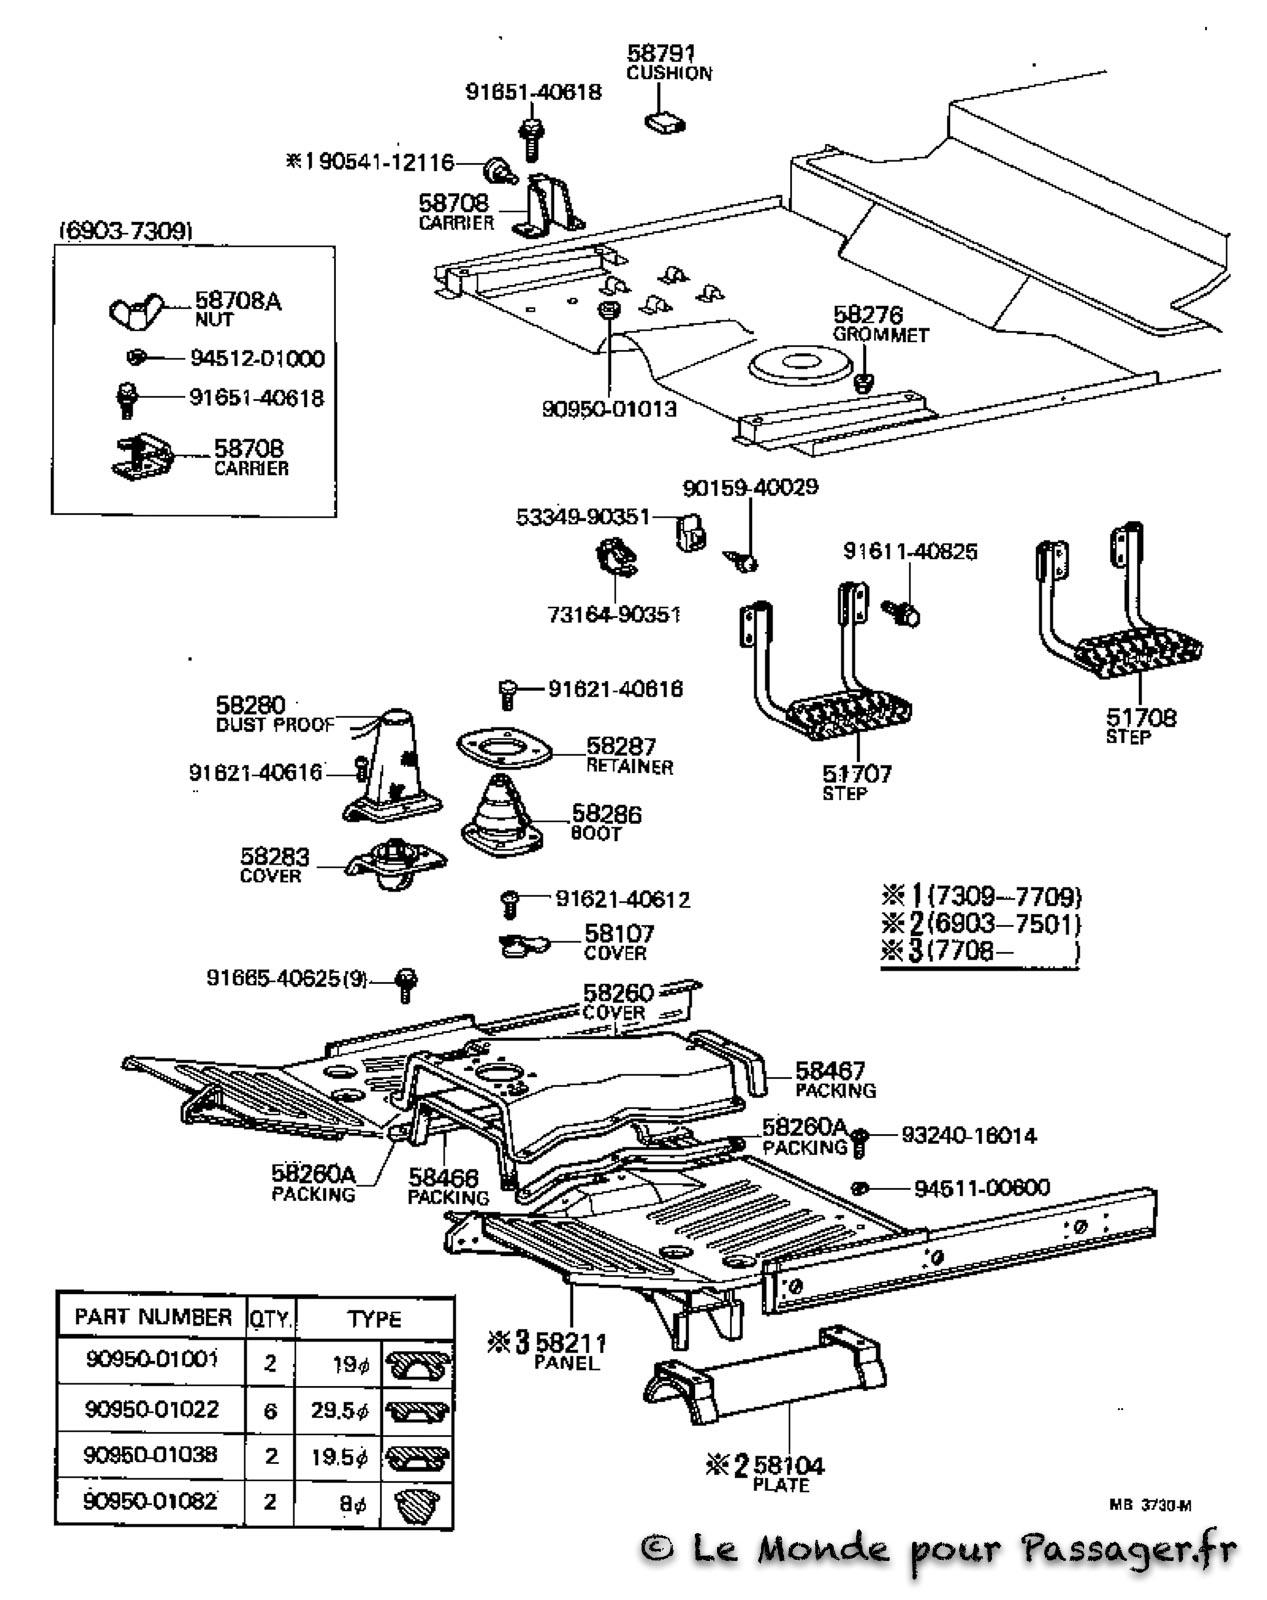 Fj55-Eclatés-Techniques030